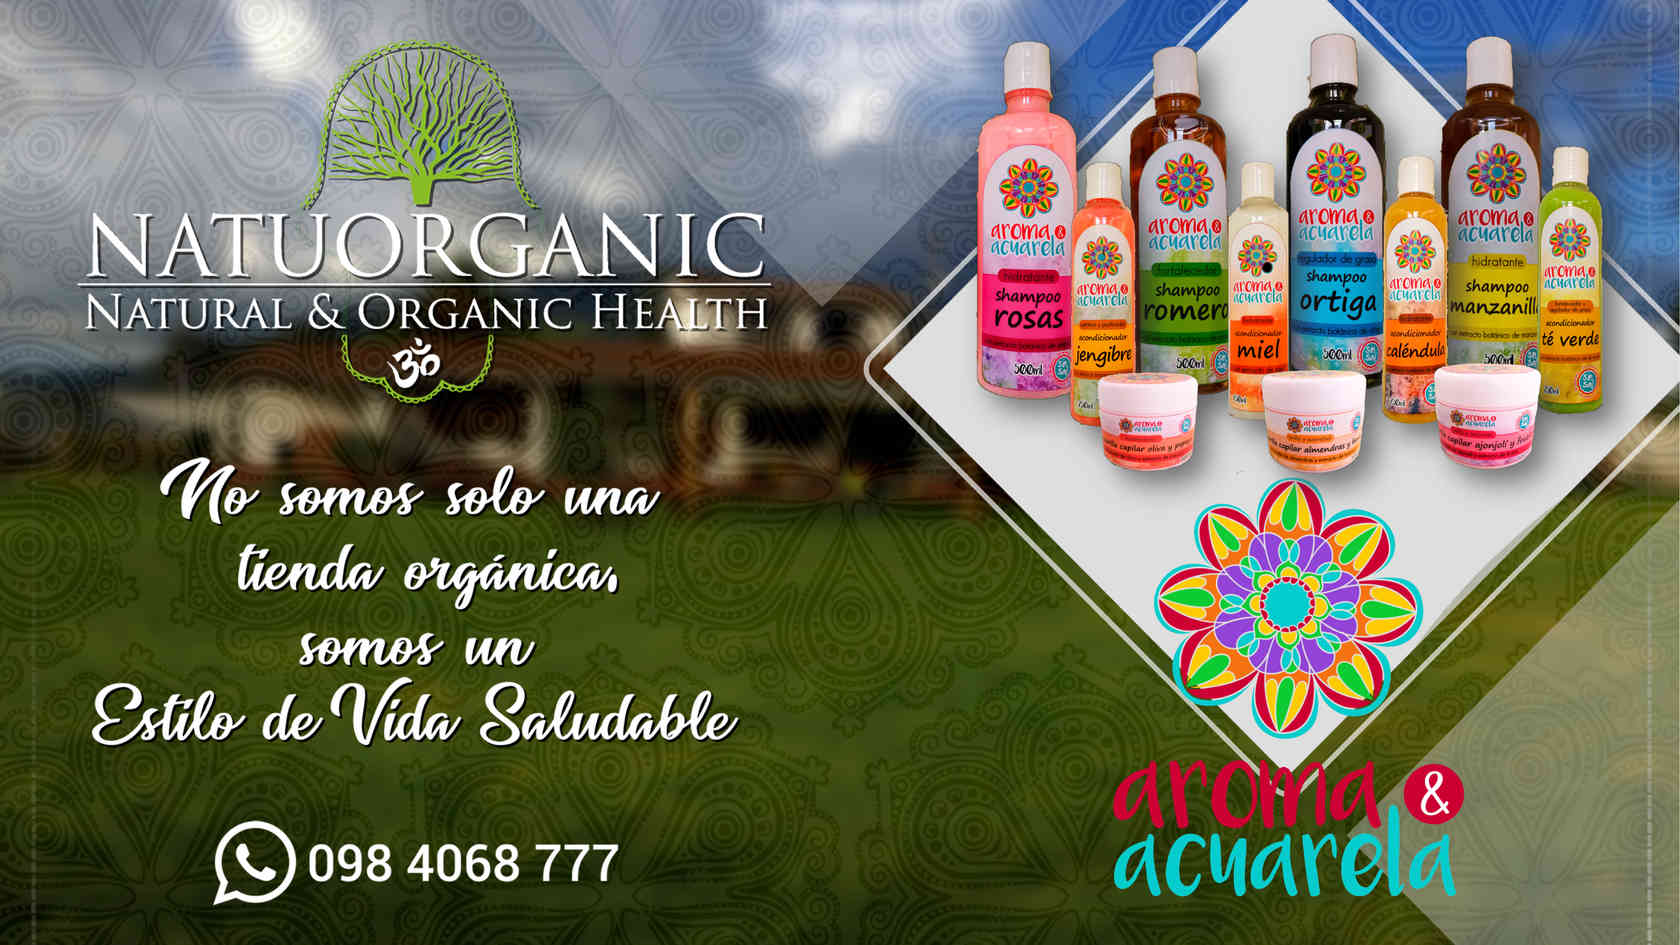 Aroma y Acuarela.jpg